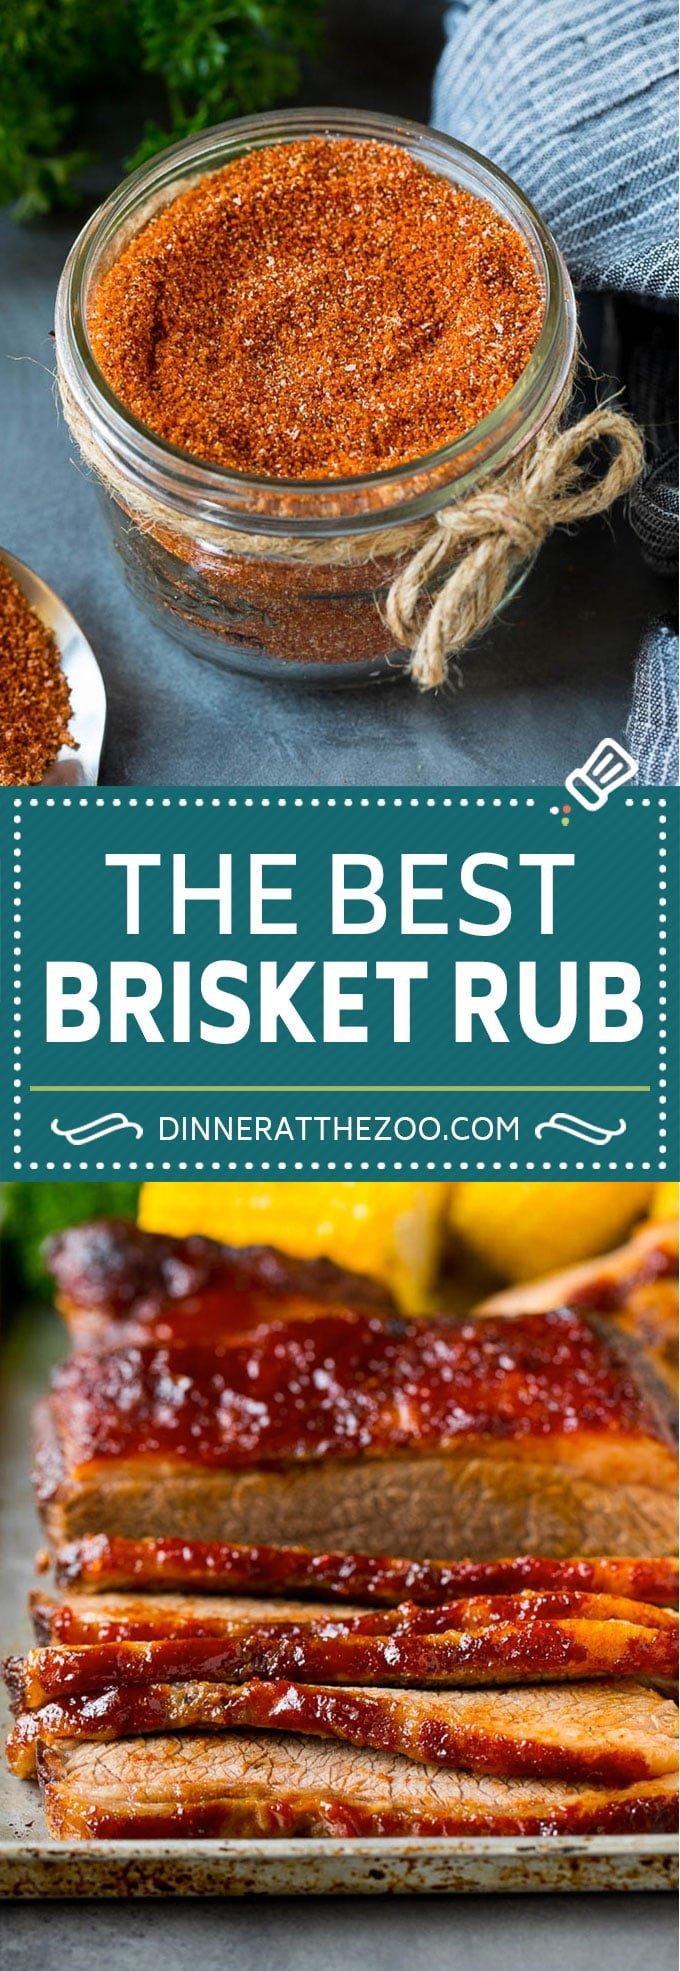 Brisket Rub Recipe #spices #beef #bbq #dinner #dinneratthezoo